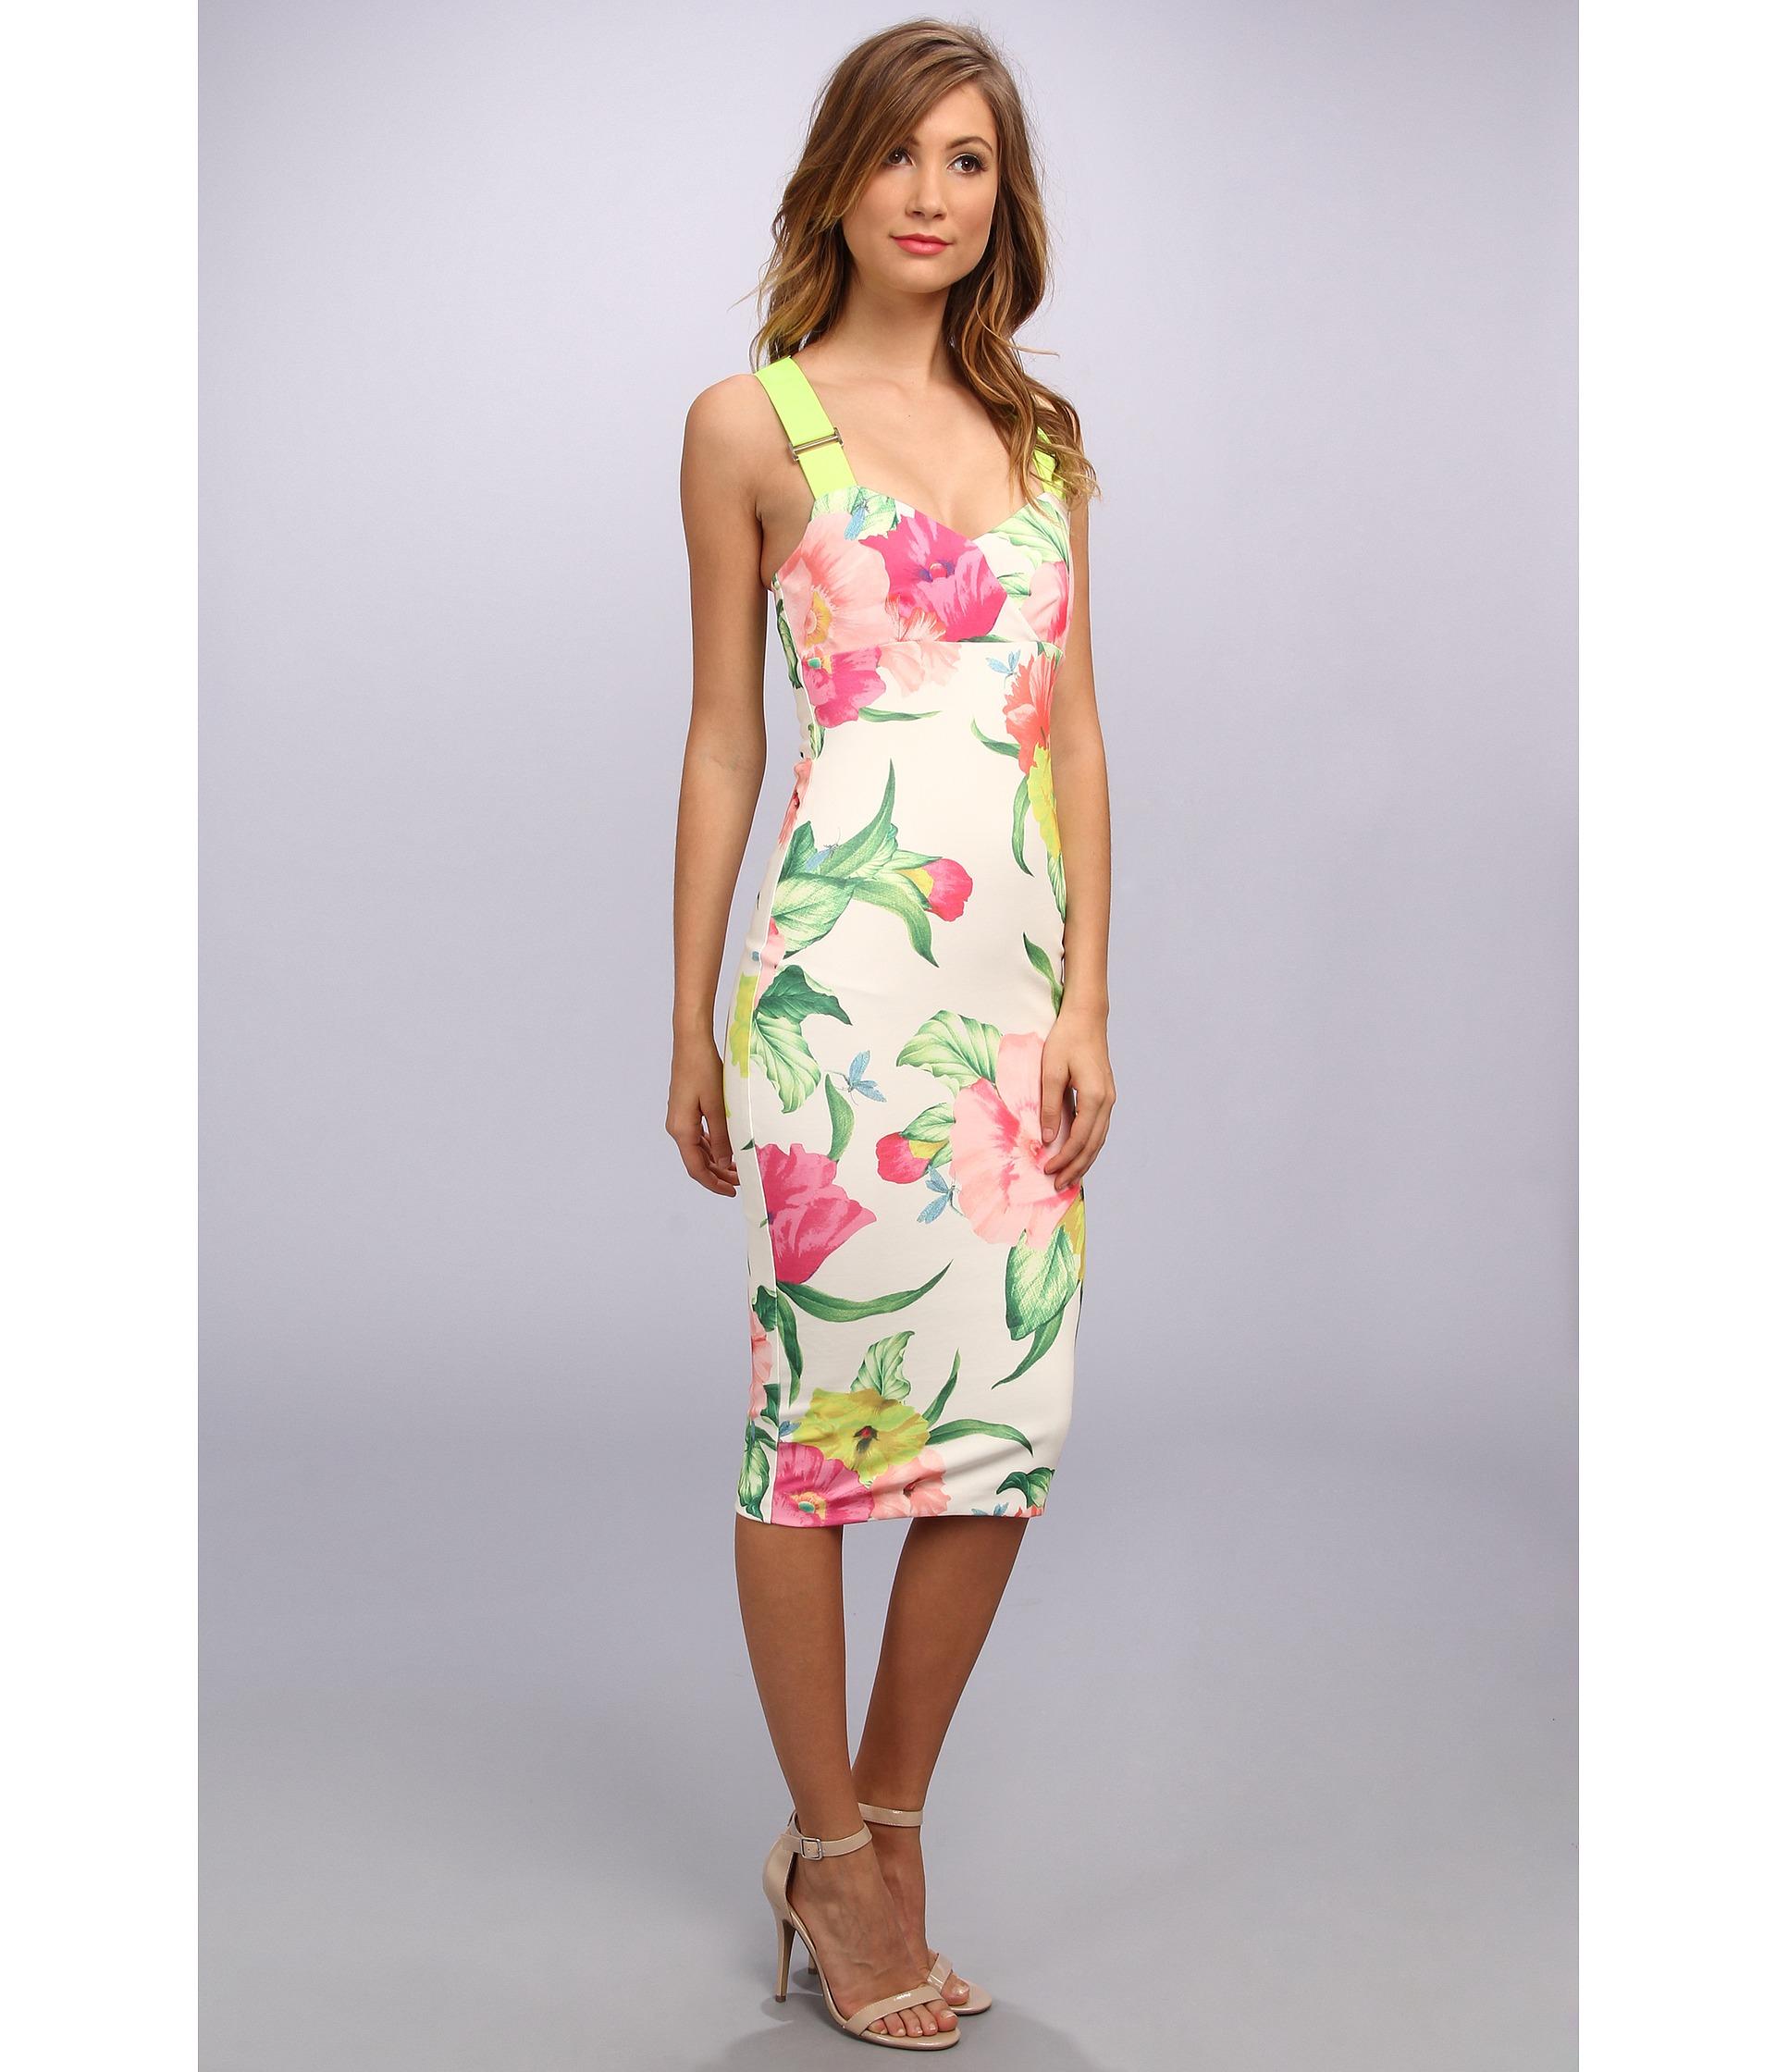 Taylor Flowers At High Tea Dress